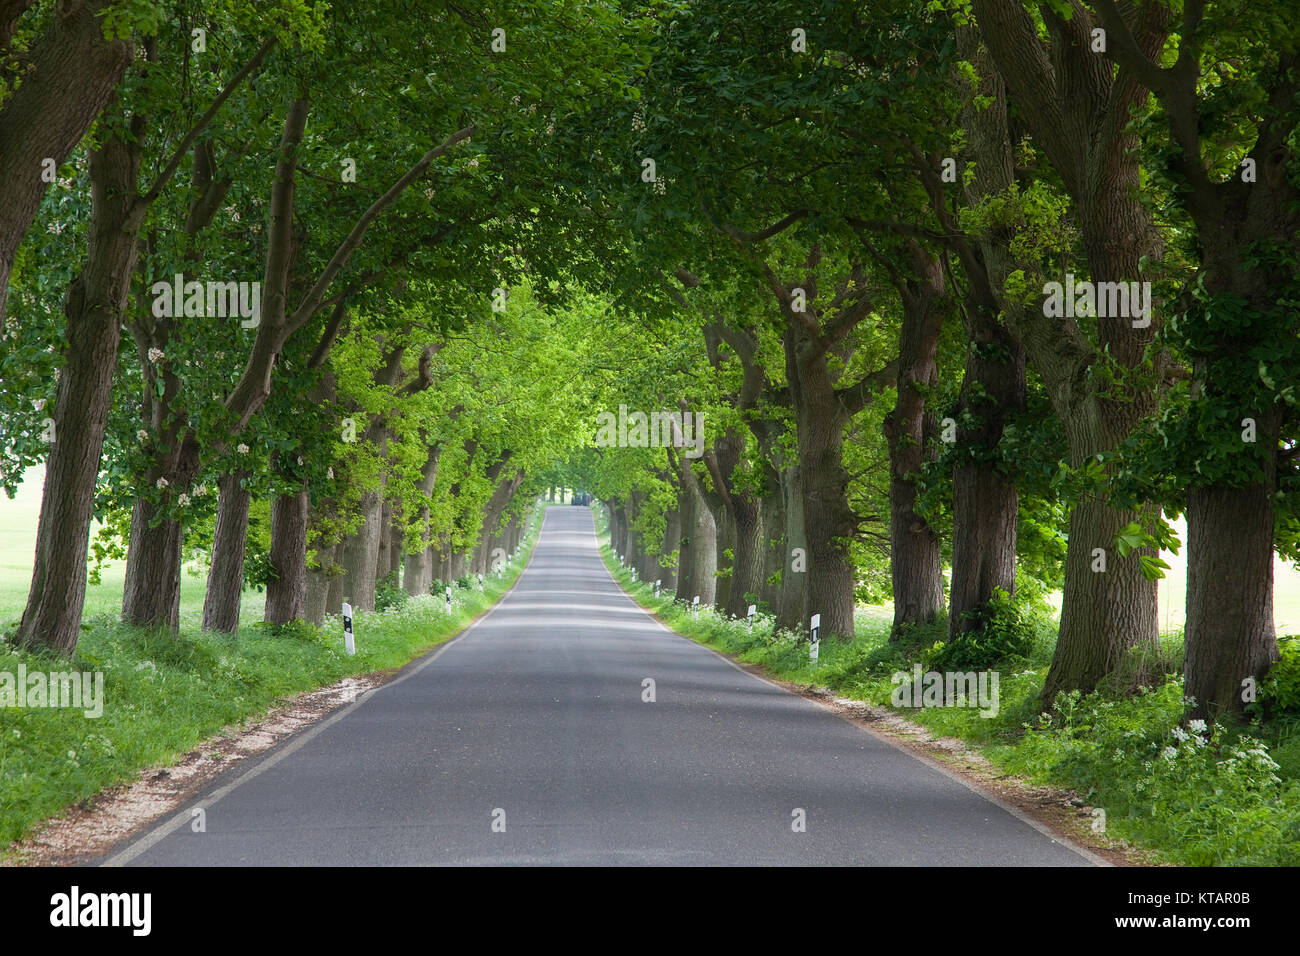 Grove, tree-lined road at Putbus, Ruegen island, Mecklenburg-Western Pomerania, Baltic Sea, Germany, Europe - Stock Image